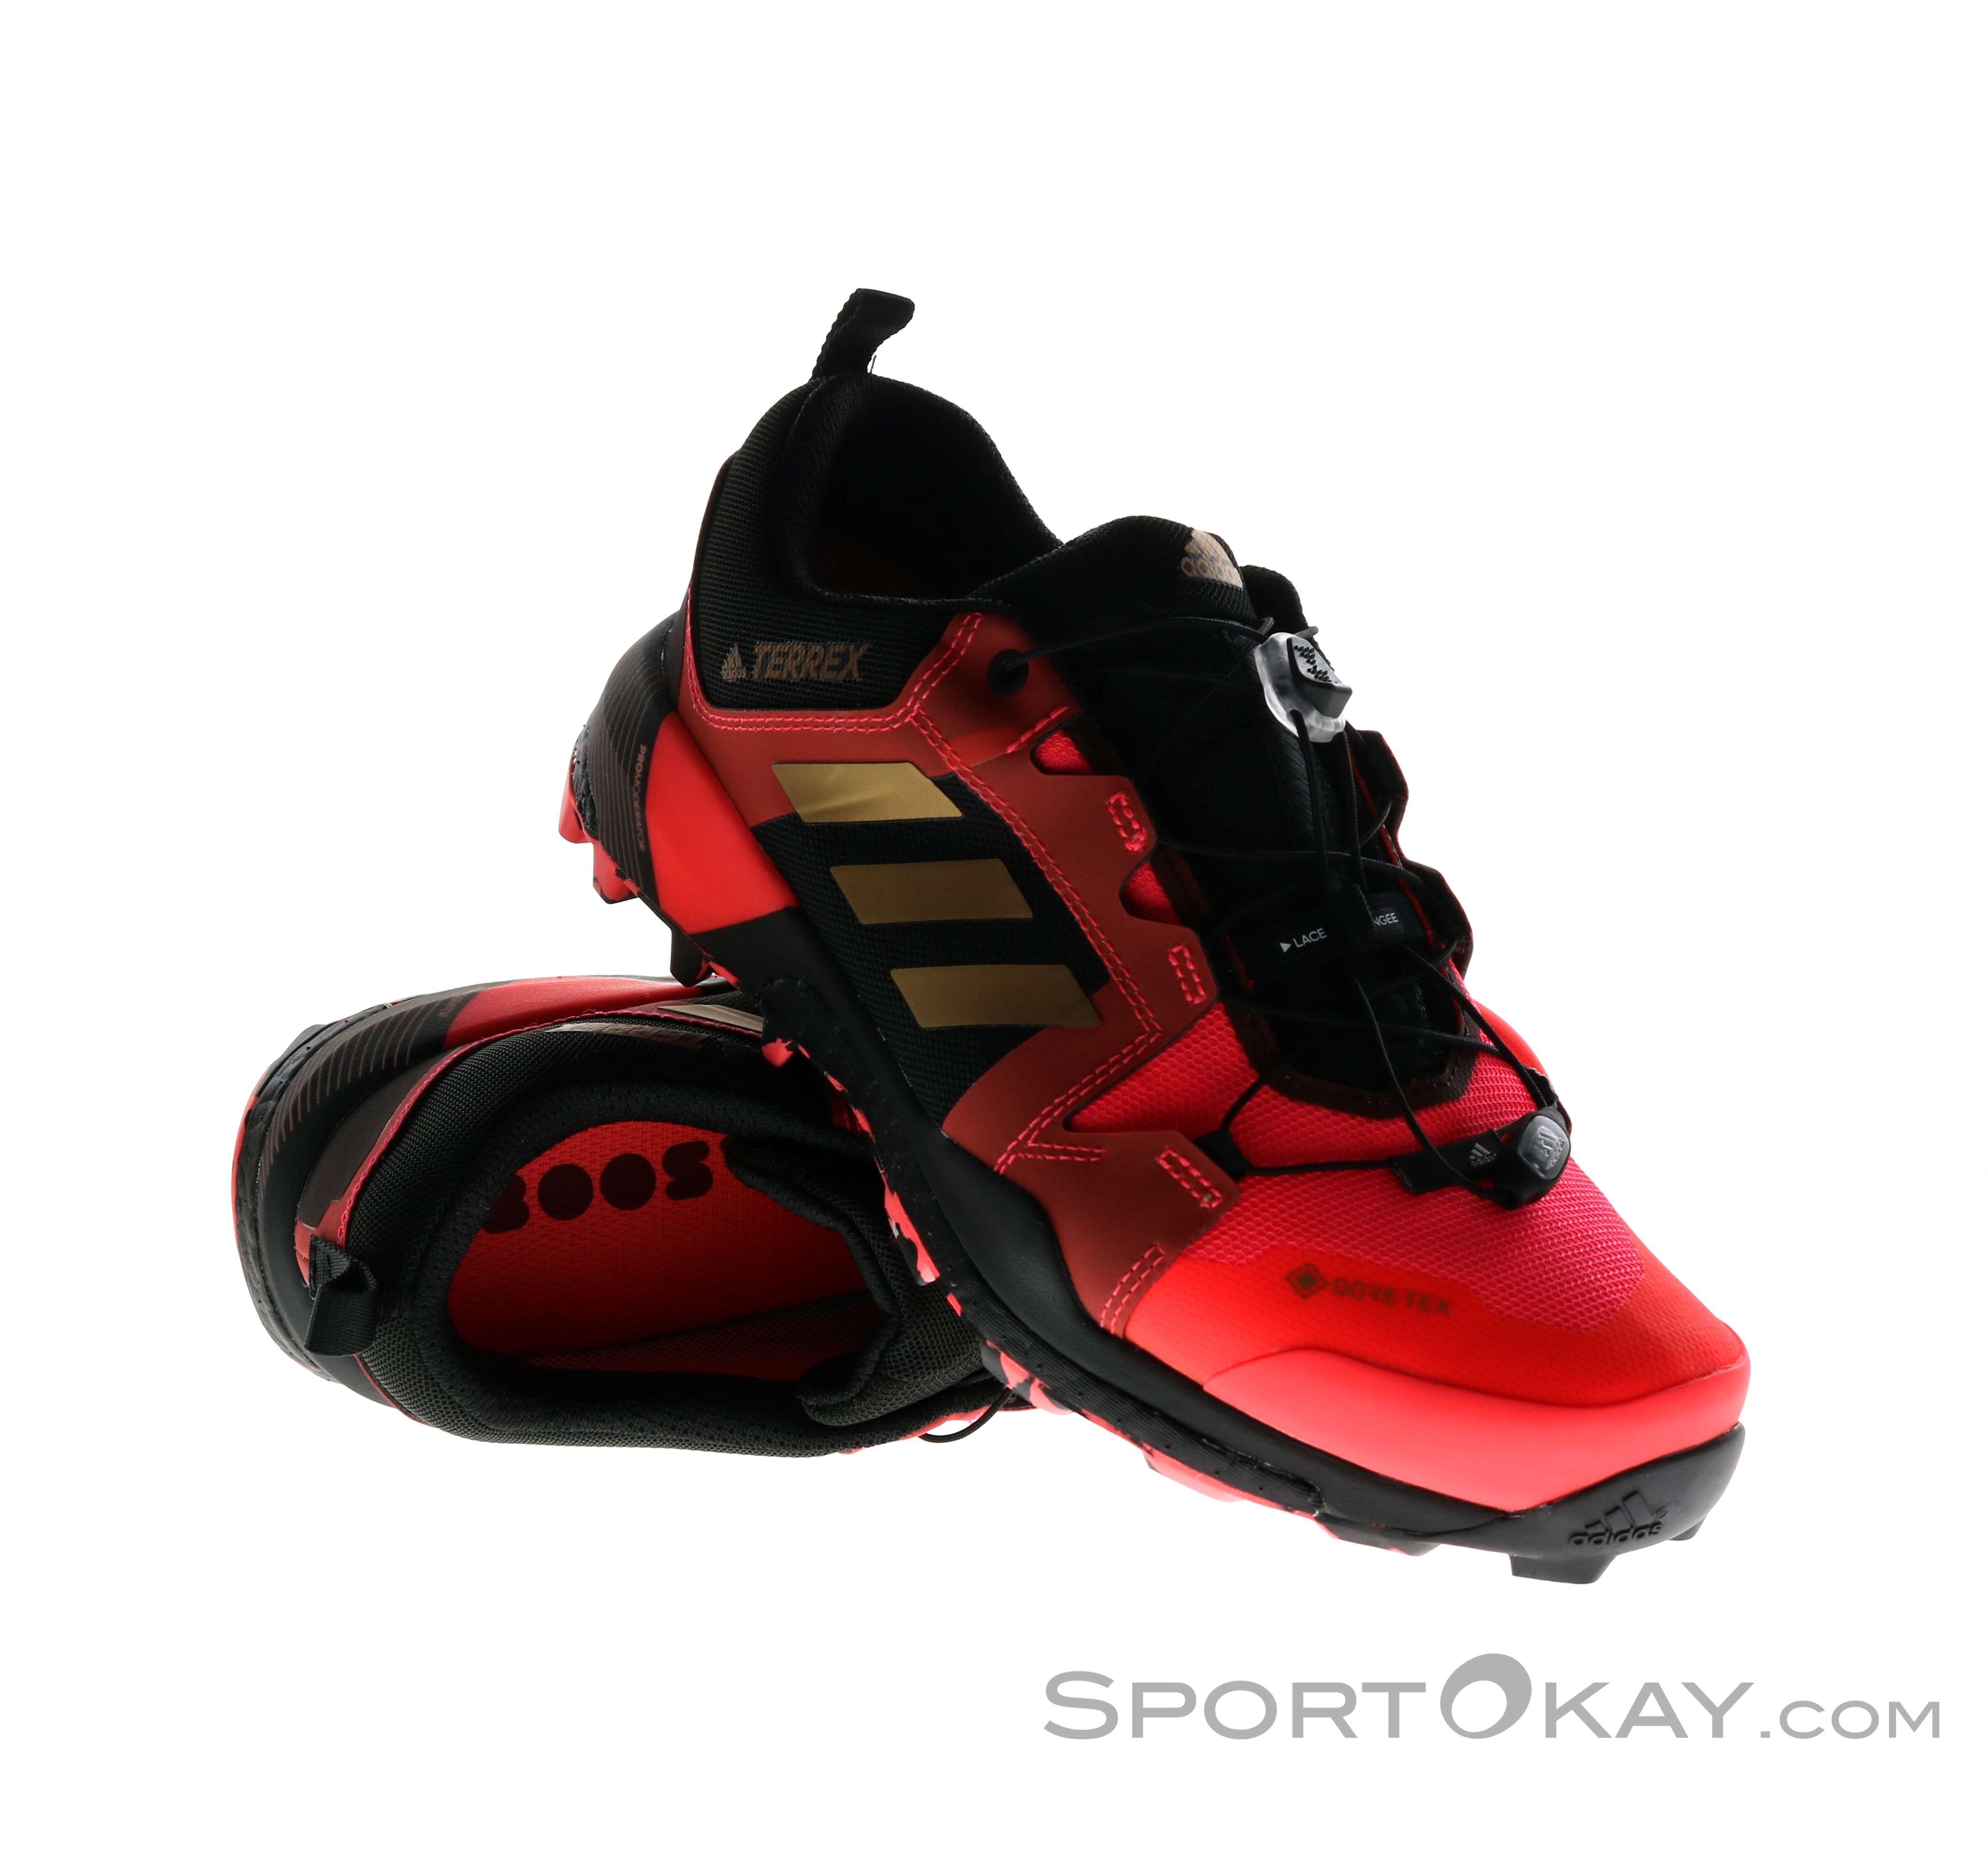 adidas Terrex adidas Terrex Skychaser GTX Mens Approach Shoes Gore-Tex